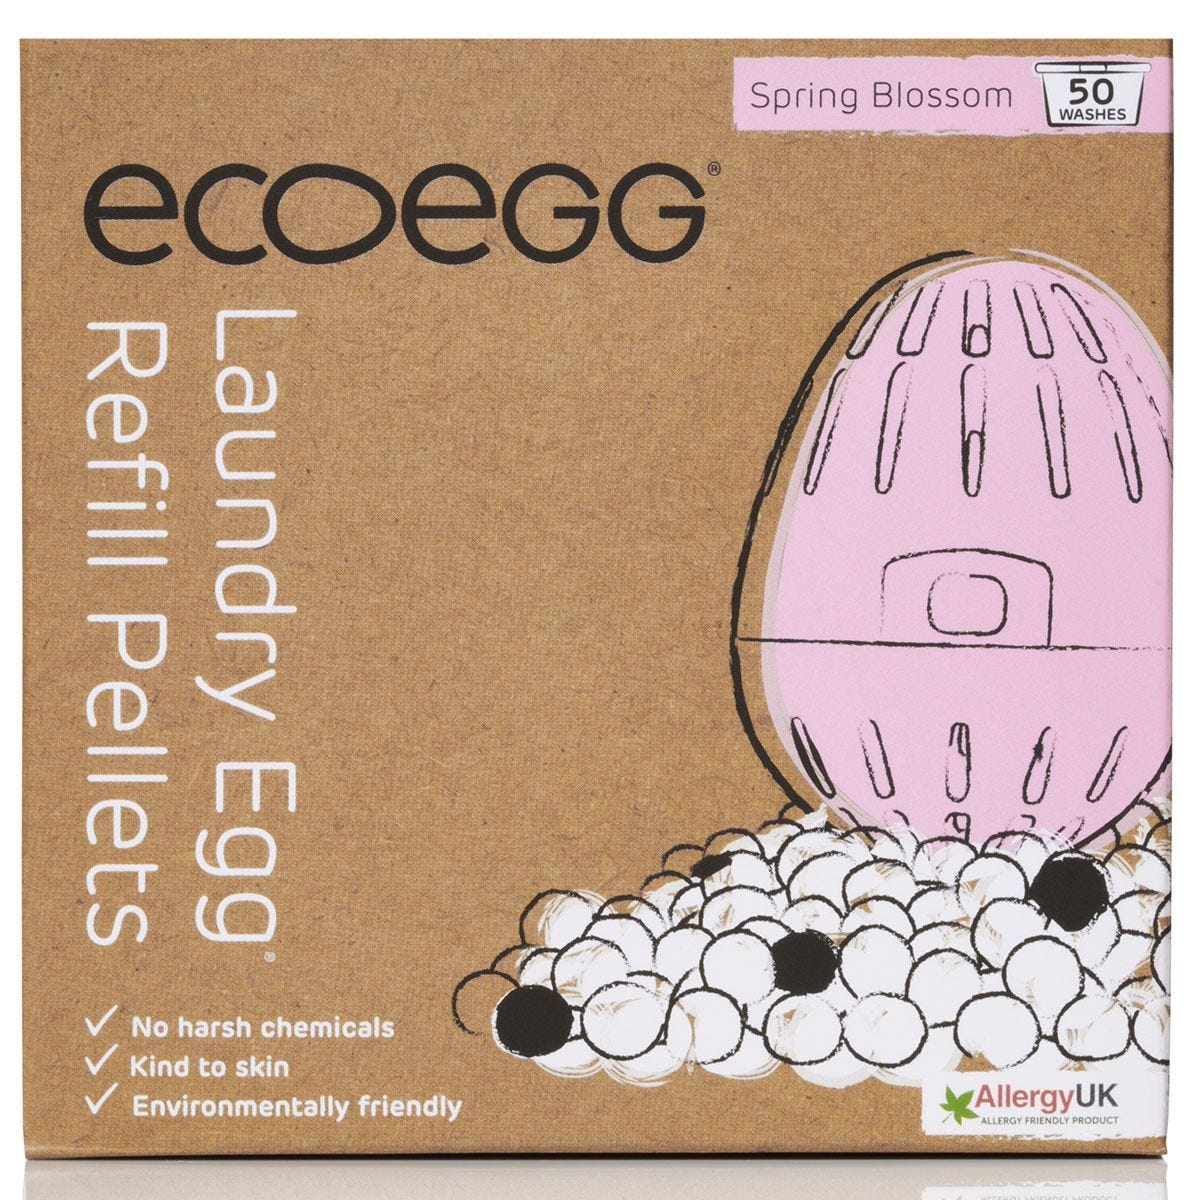 Ecoegg Spring Blossom Laundry Egg Refill Pellets - 50 Washes